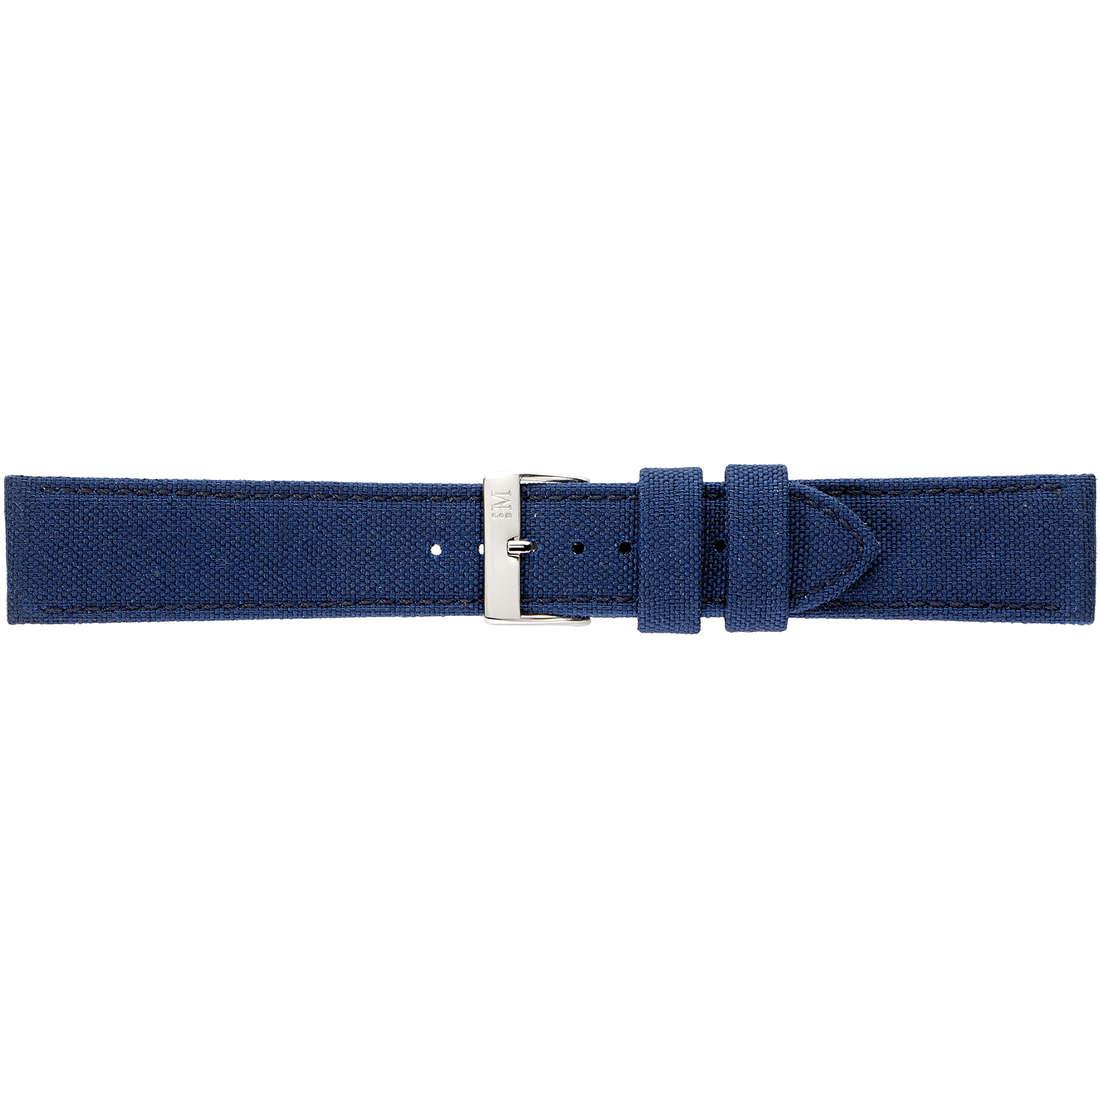 montre bande de montres homme Morellato Linea Sport A01U2779110061CR18